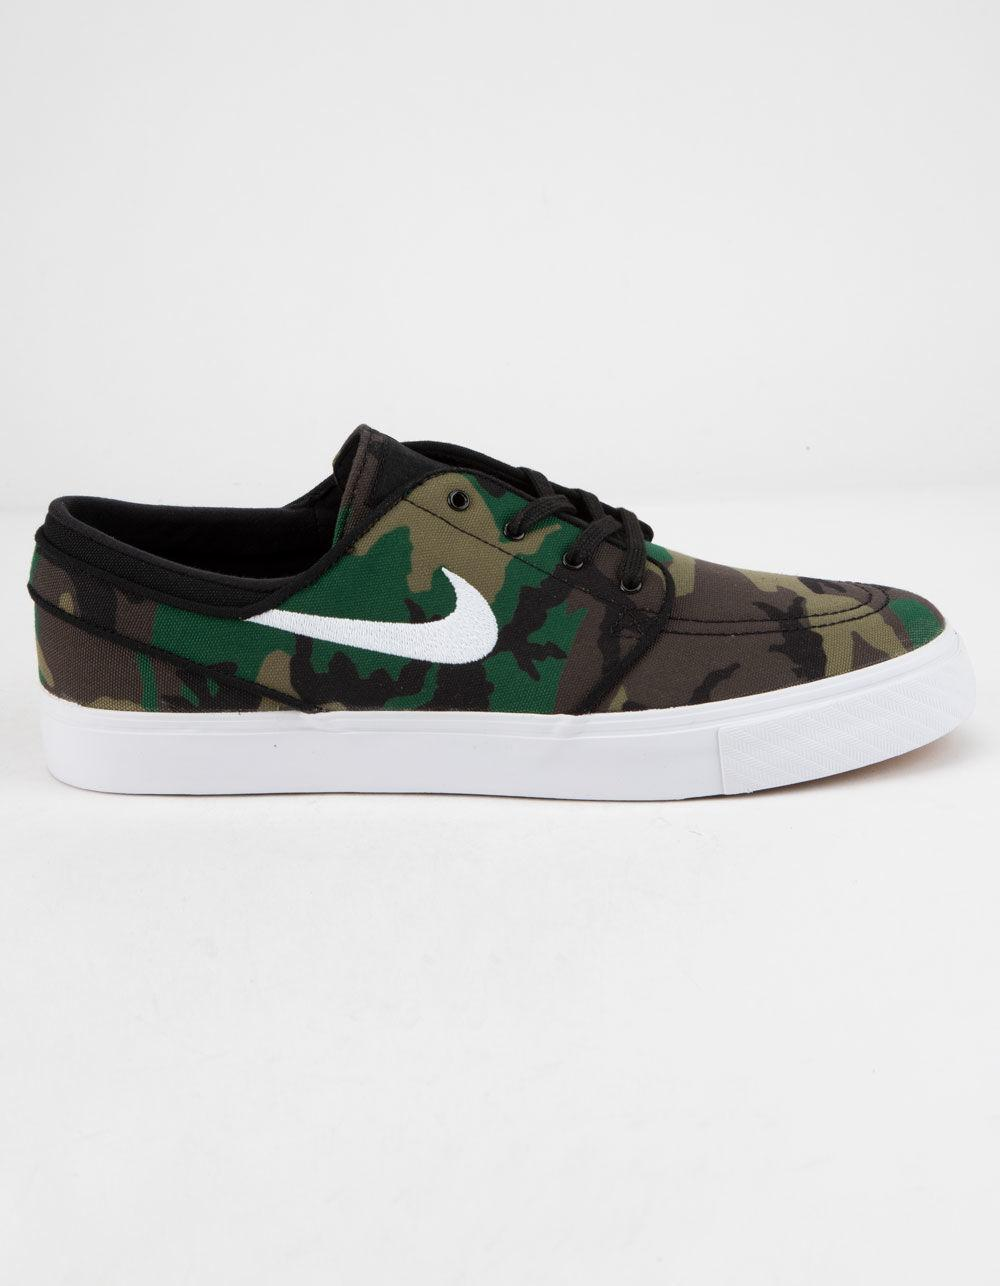 d193d5b5e6 Nike Zoom Stefan Janoski Canvas Camo Mens Shoes in Green for Men - Lyst